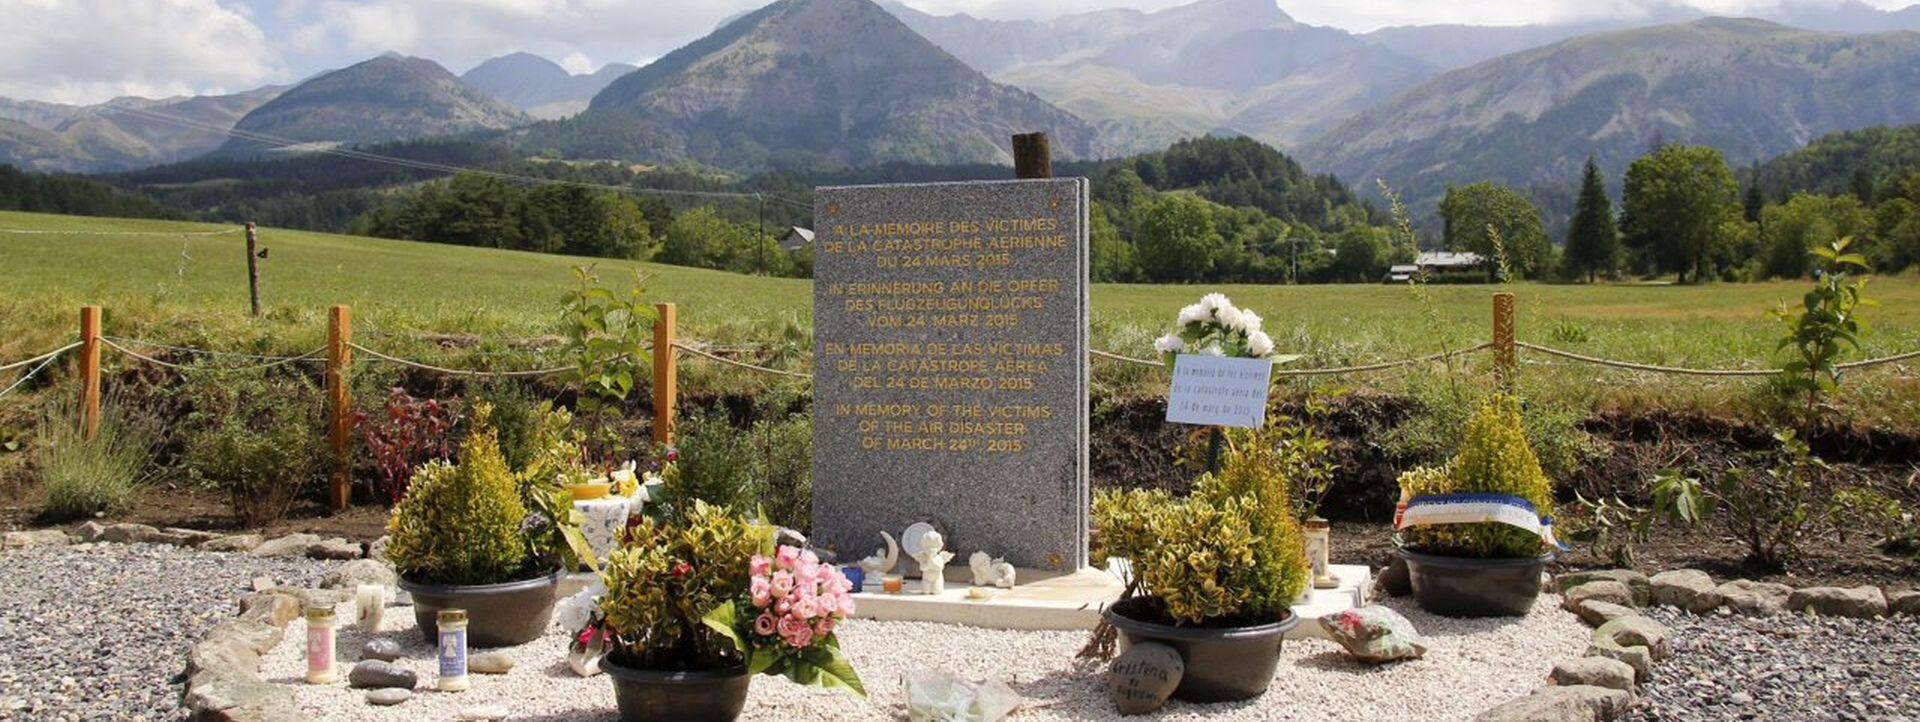 TRAGEDIJA GERMANWINGS-a: Neidentificirani ostaci žrtava pokopani u diskreciji